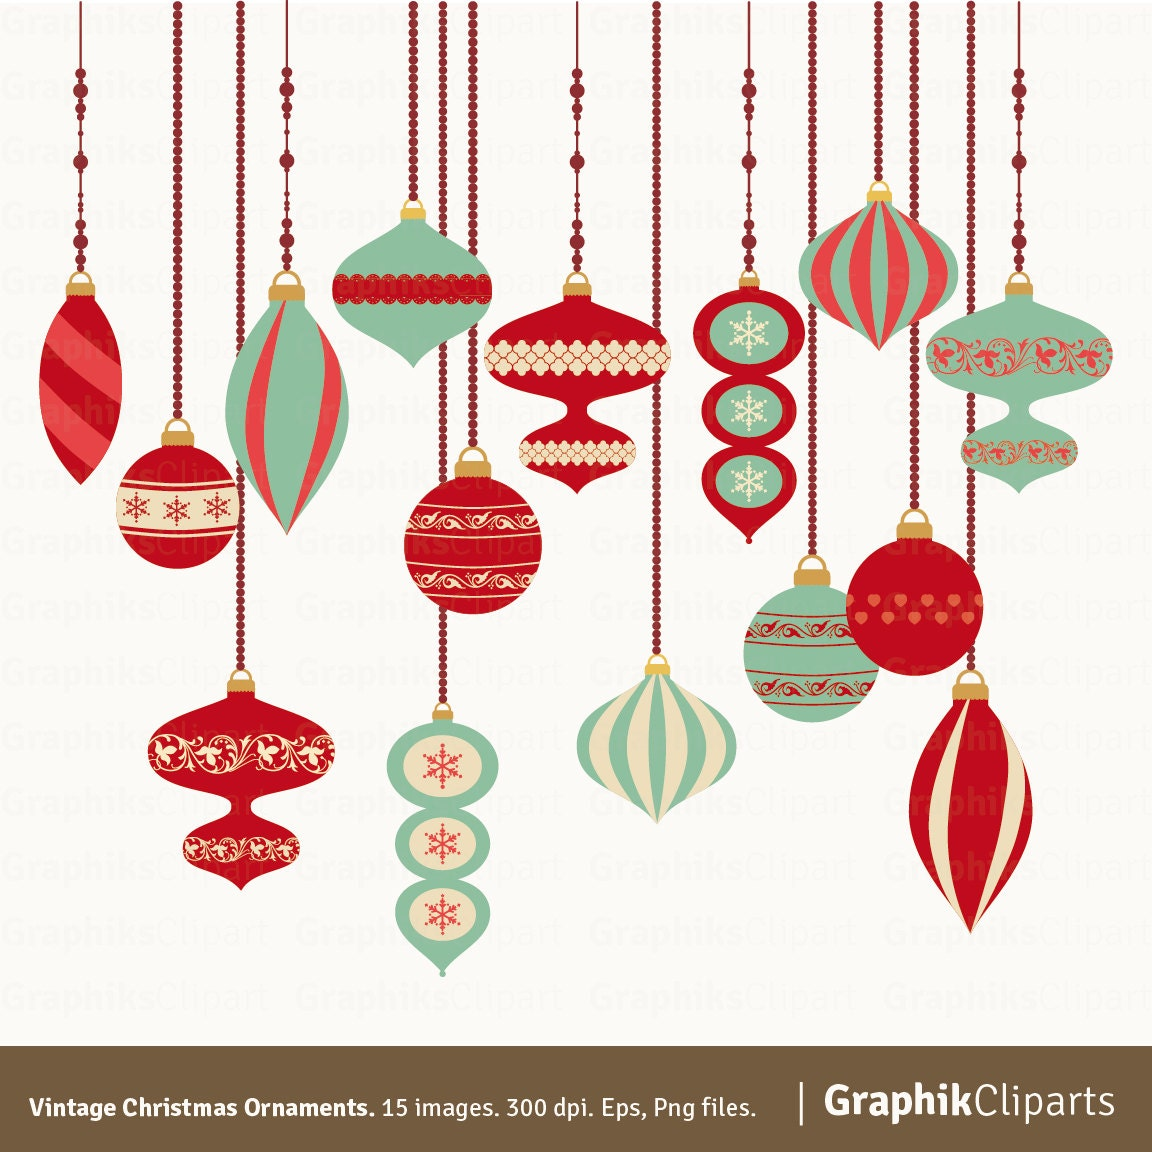 zoom - Vintage Christmas Ornaments